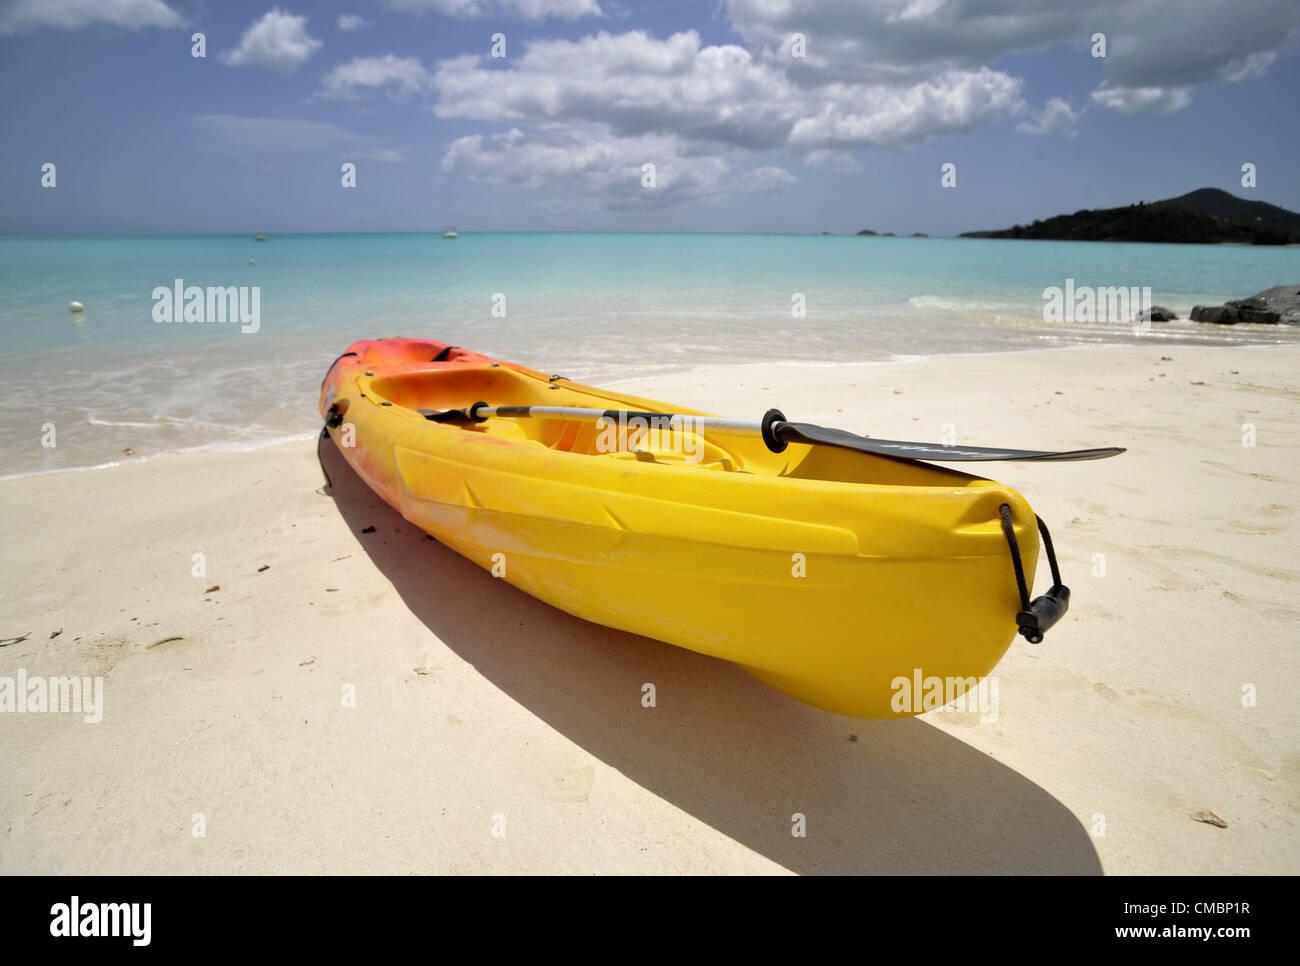 June 19, 2012 - Jolly Beach, Antigua, U.S. - A kayak sits ready for action on Jolly Beach on the Caribbean island - Stock Image